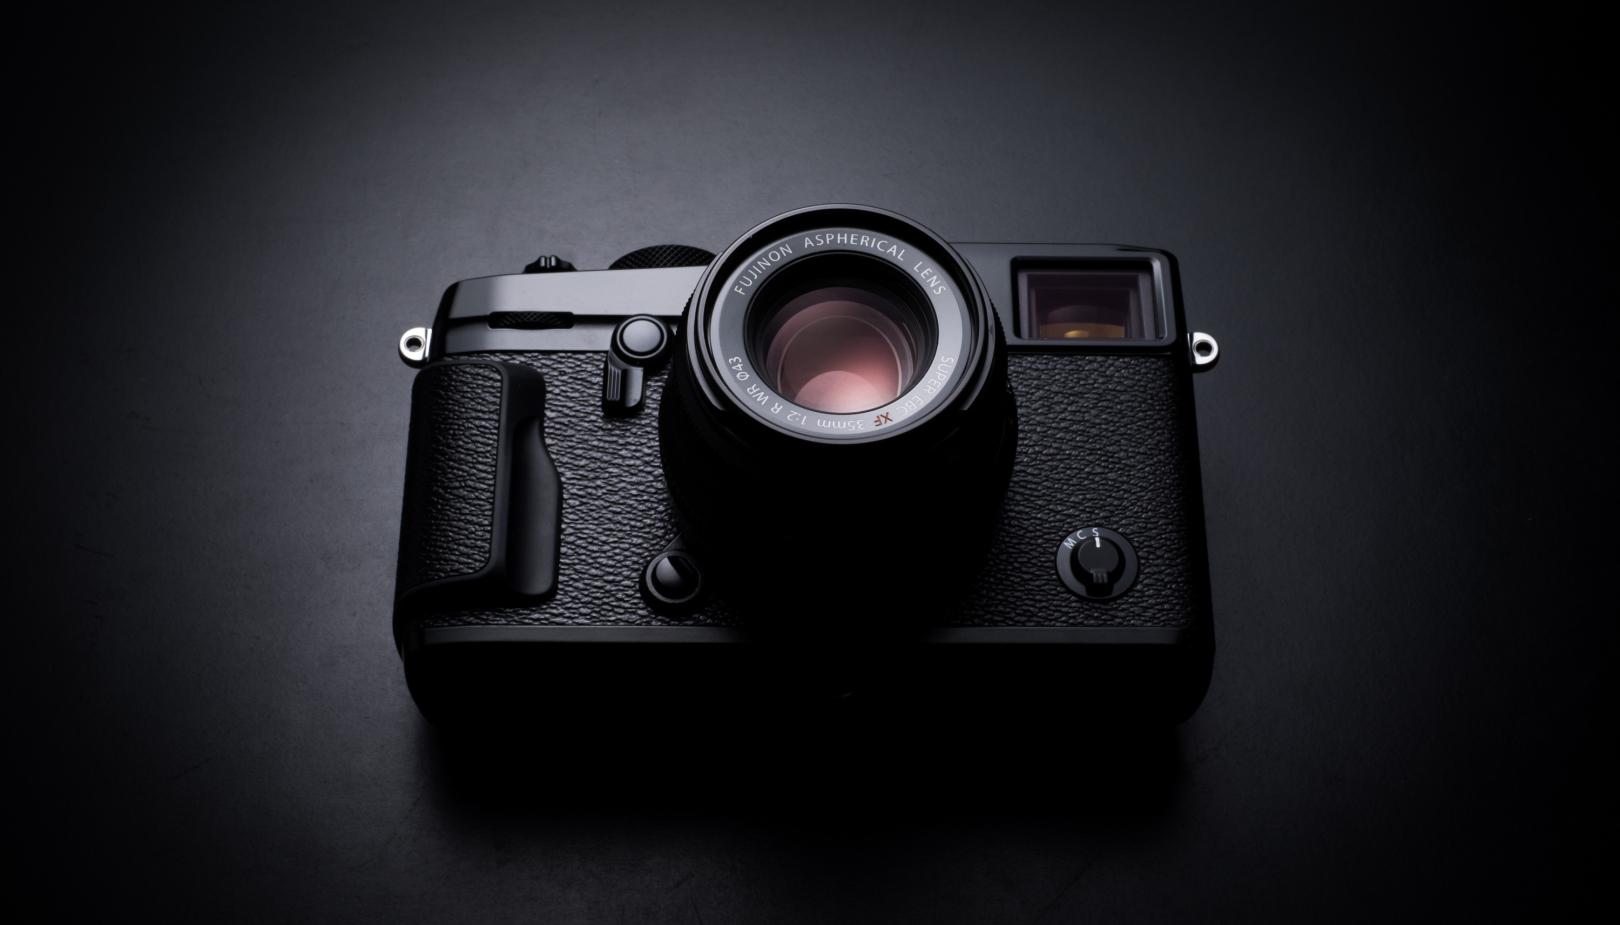 Тест Fujifilm X-Pro2 by Jonas Rask